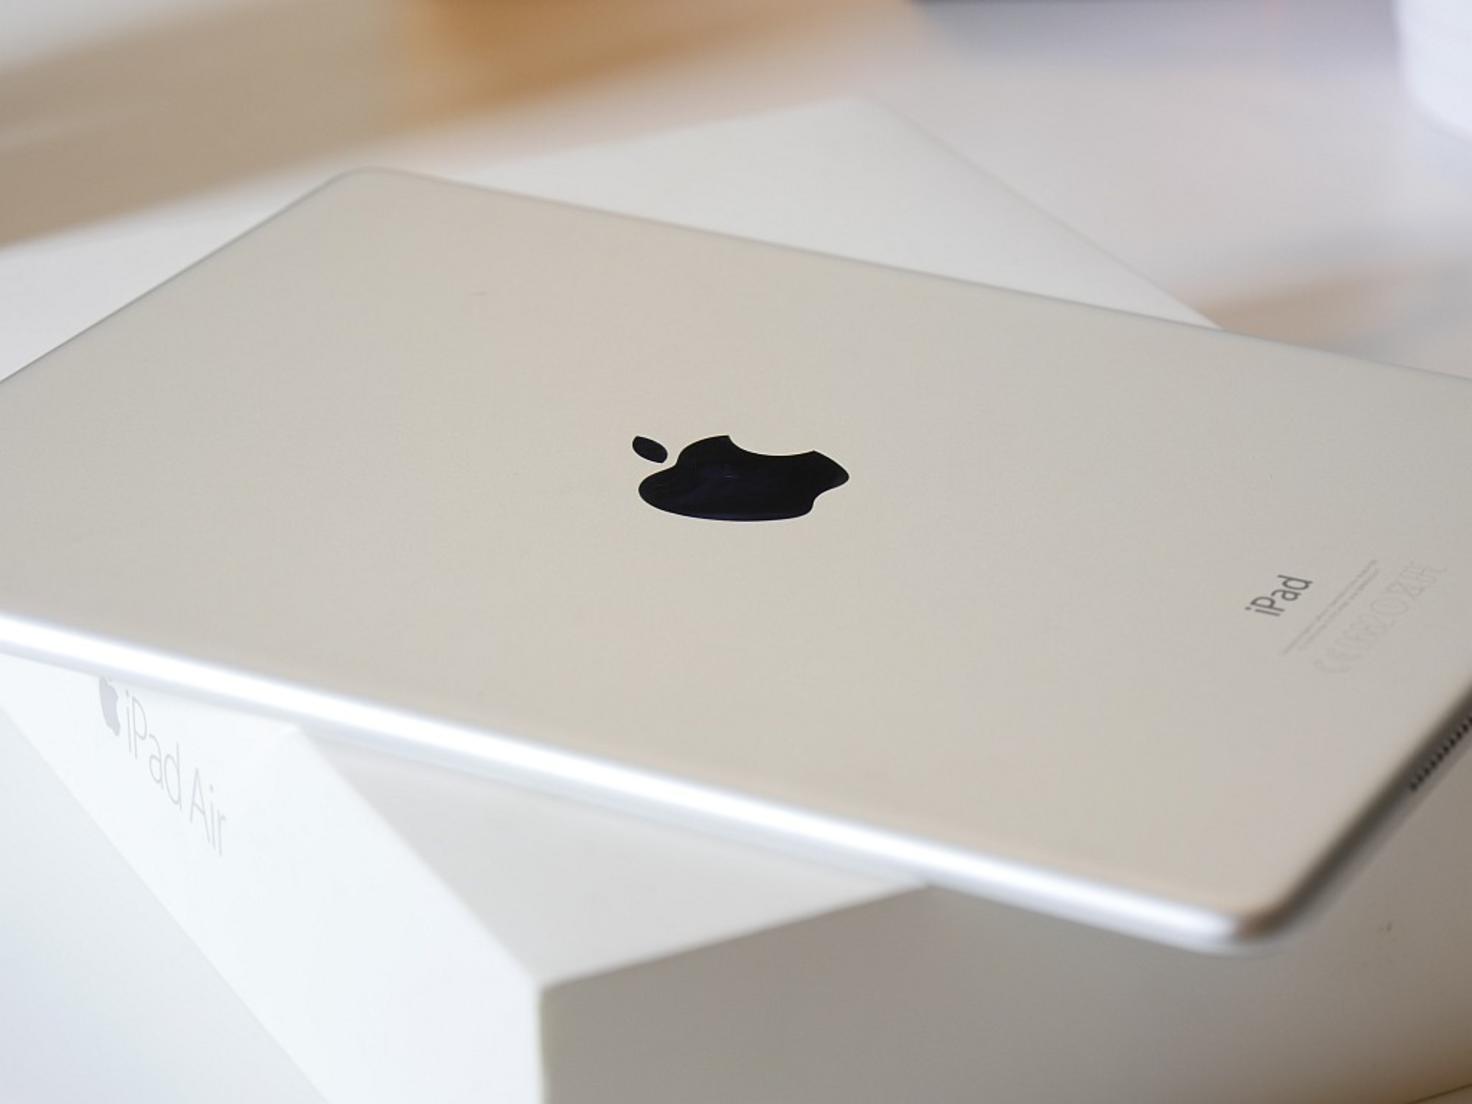 iPad Air 2 Rückseite